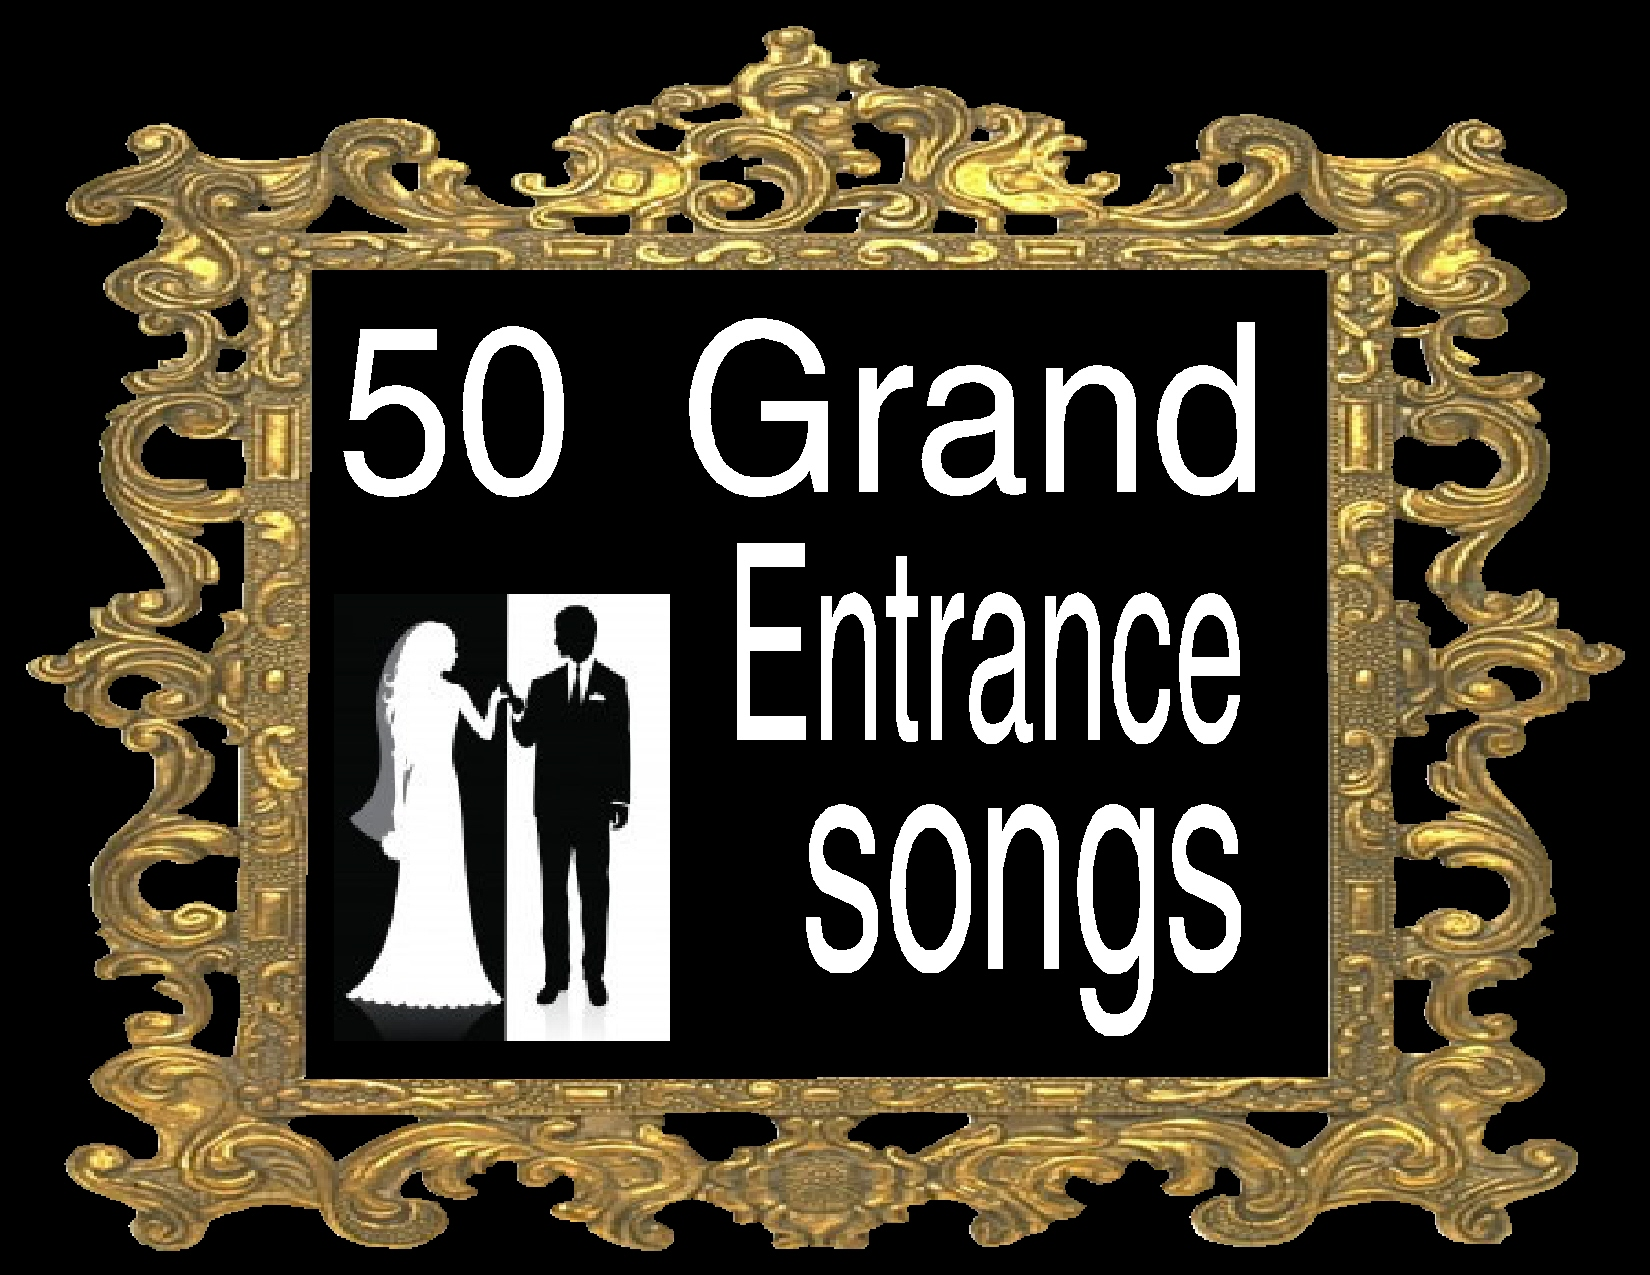 Top 20 Wedding Grand Entrance Songs 2016 Bridal Party: 50 Grand Enterance Songs